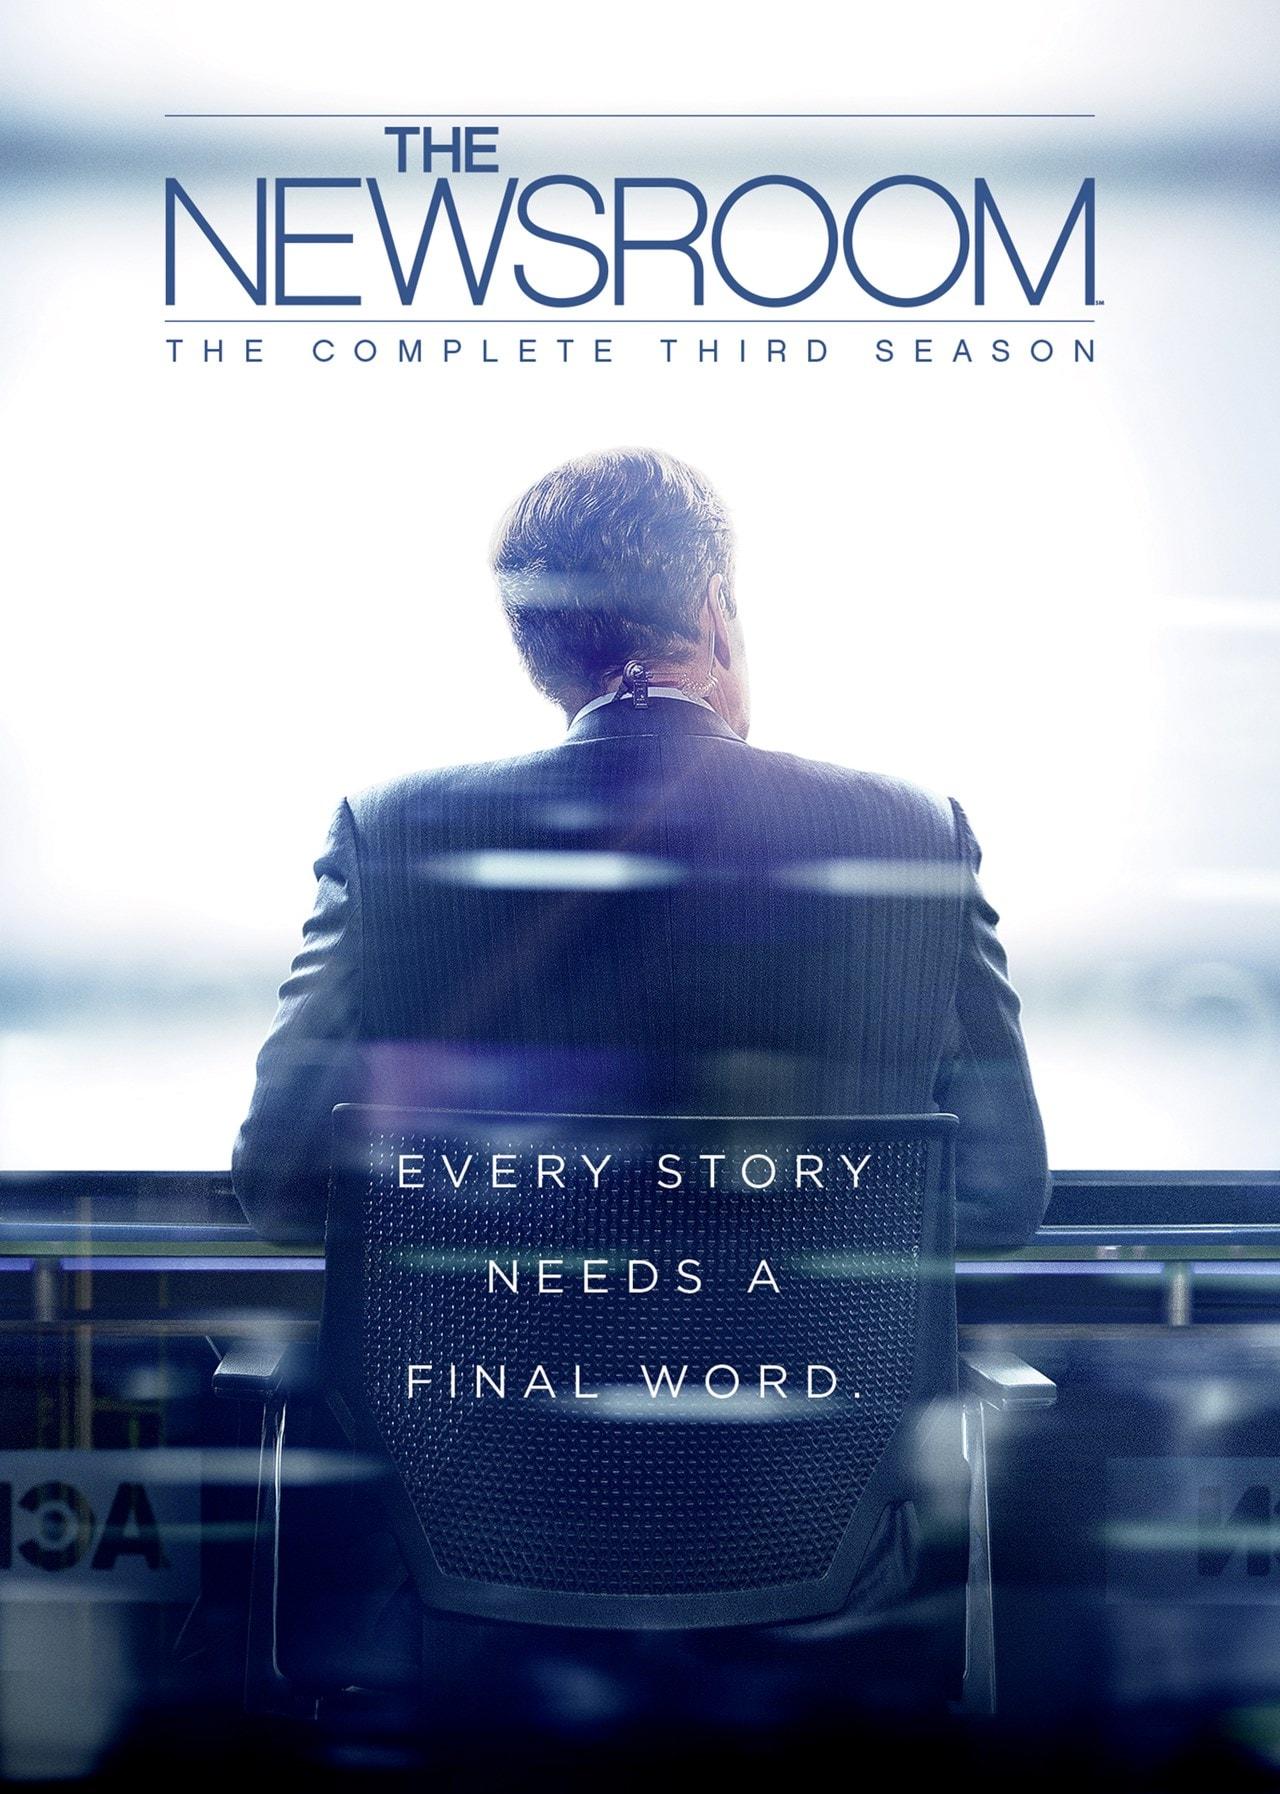 The Newsroom: The Complete Third Season - 1